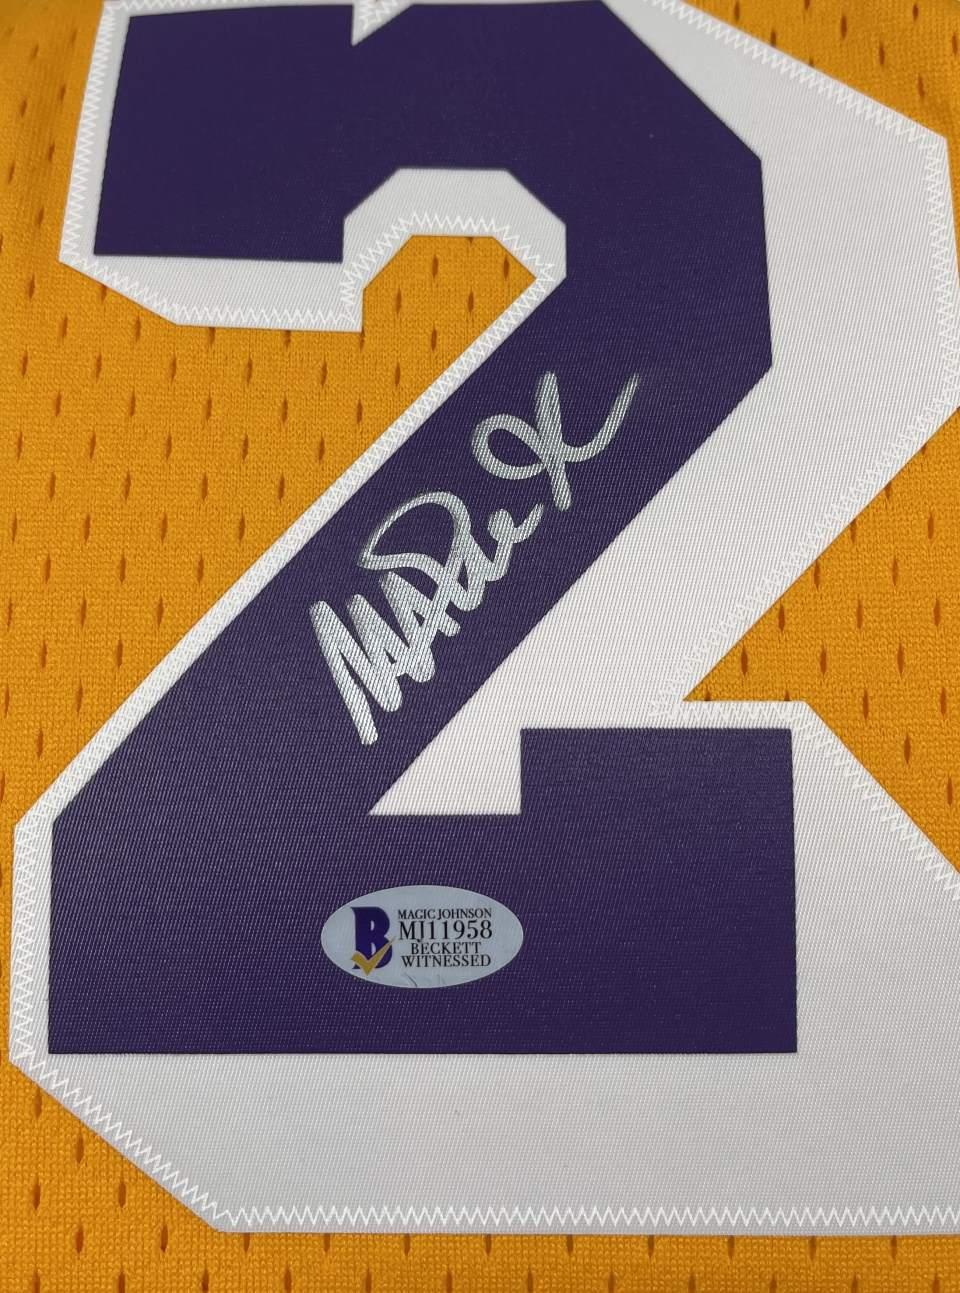 Lakers Magic Johnson Signed 1984-85 M&N HWC Swingman Yellow Jersey [BAS MJ11958]